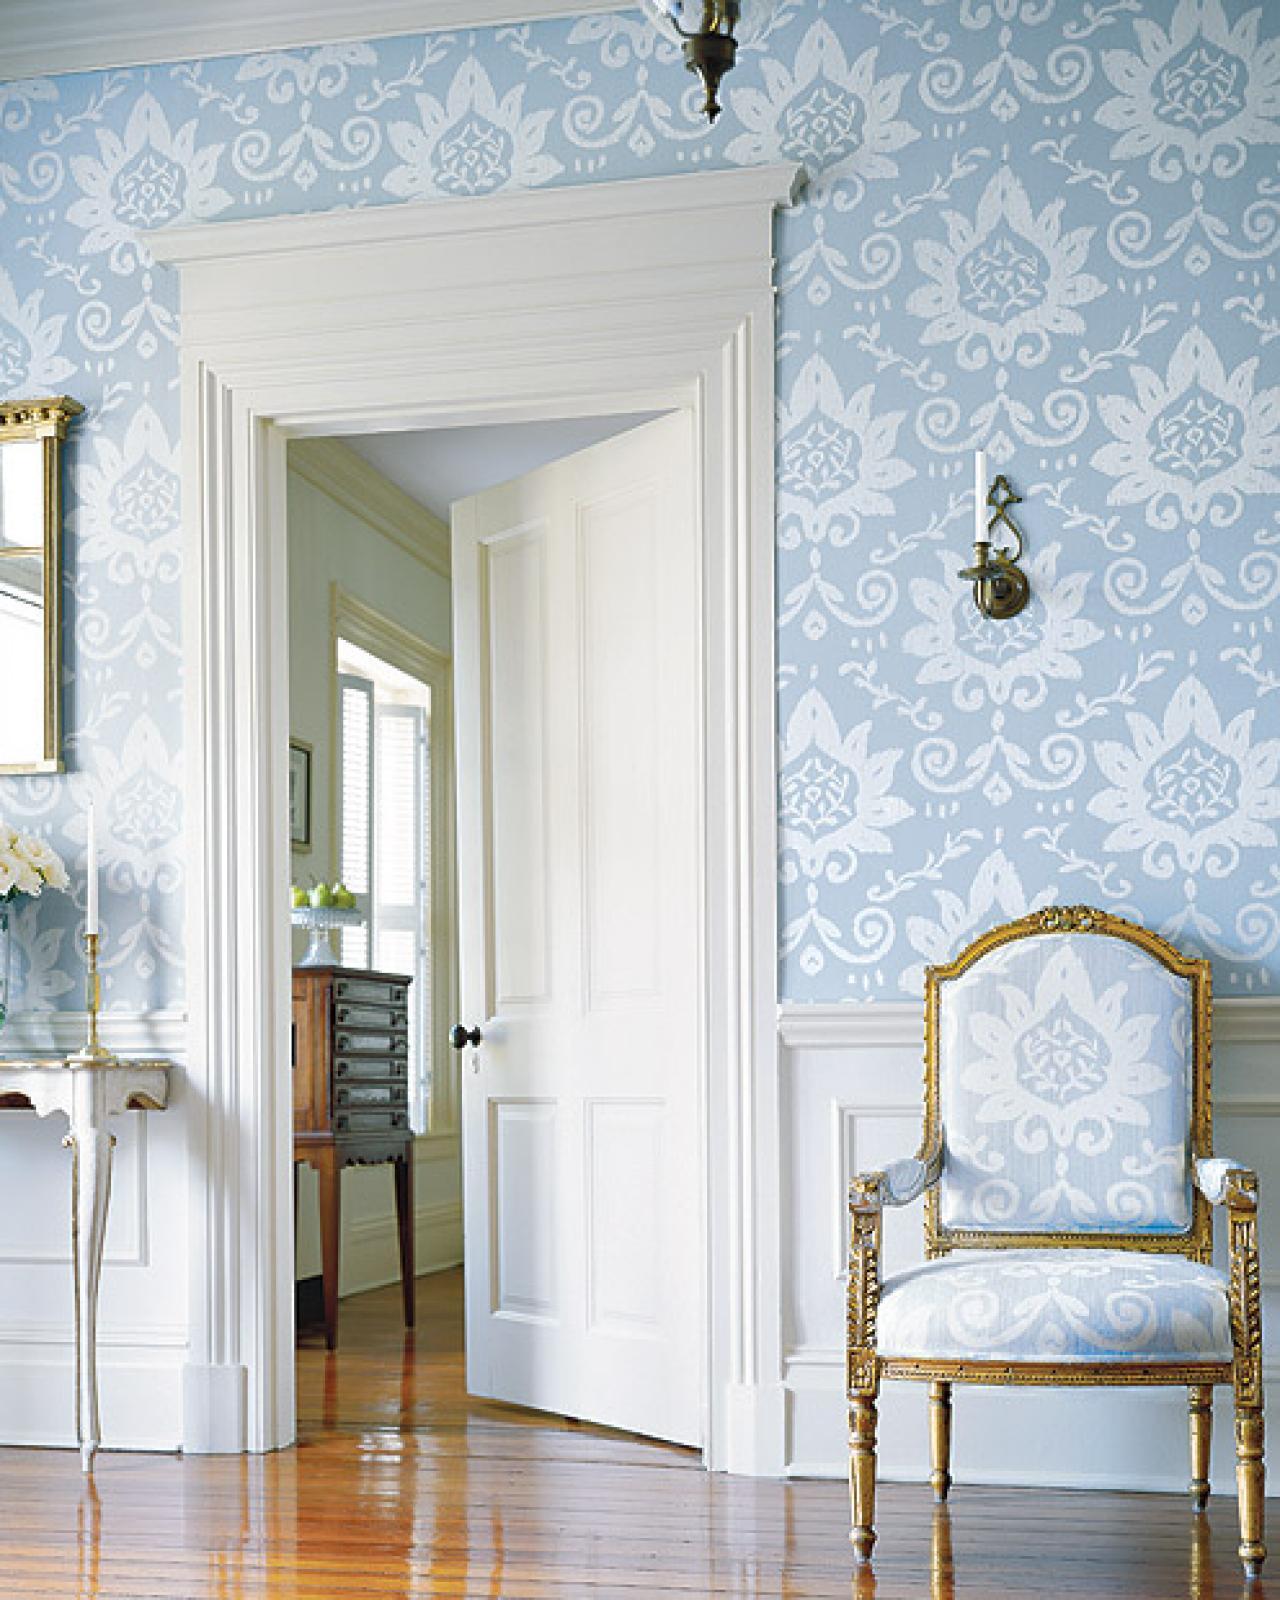 Contemporary Wallpaper Ideas Interior Design Styles and Color 1280x1600